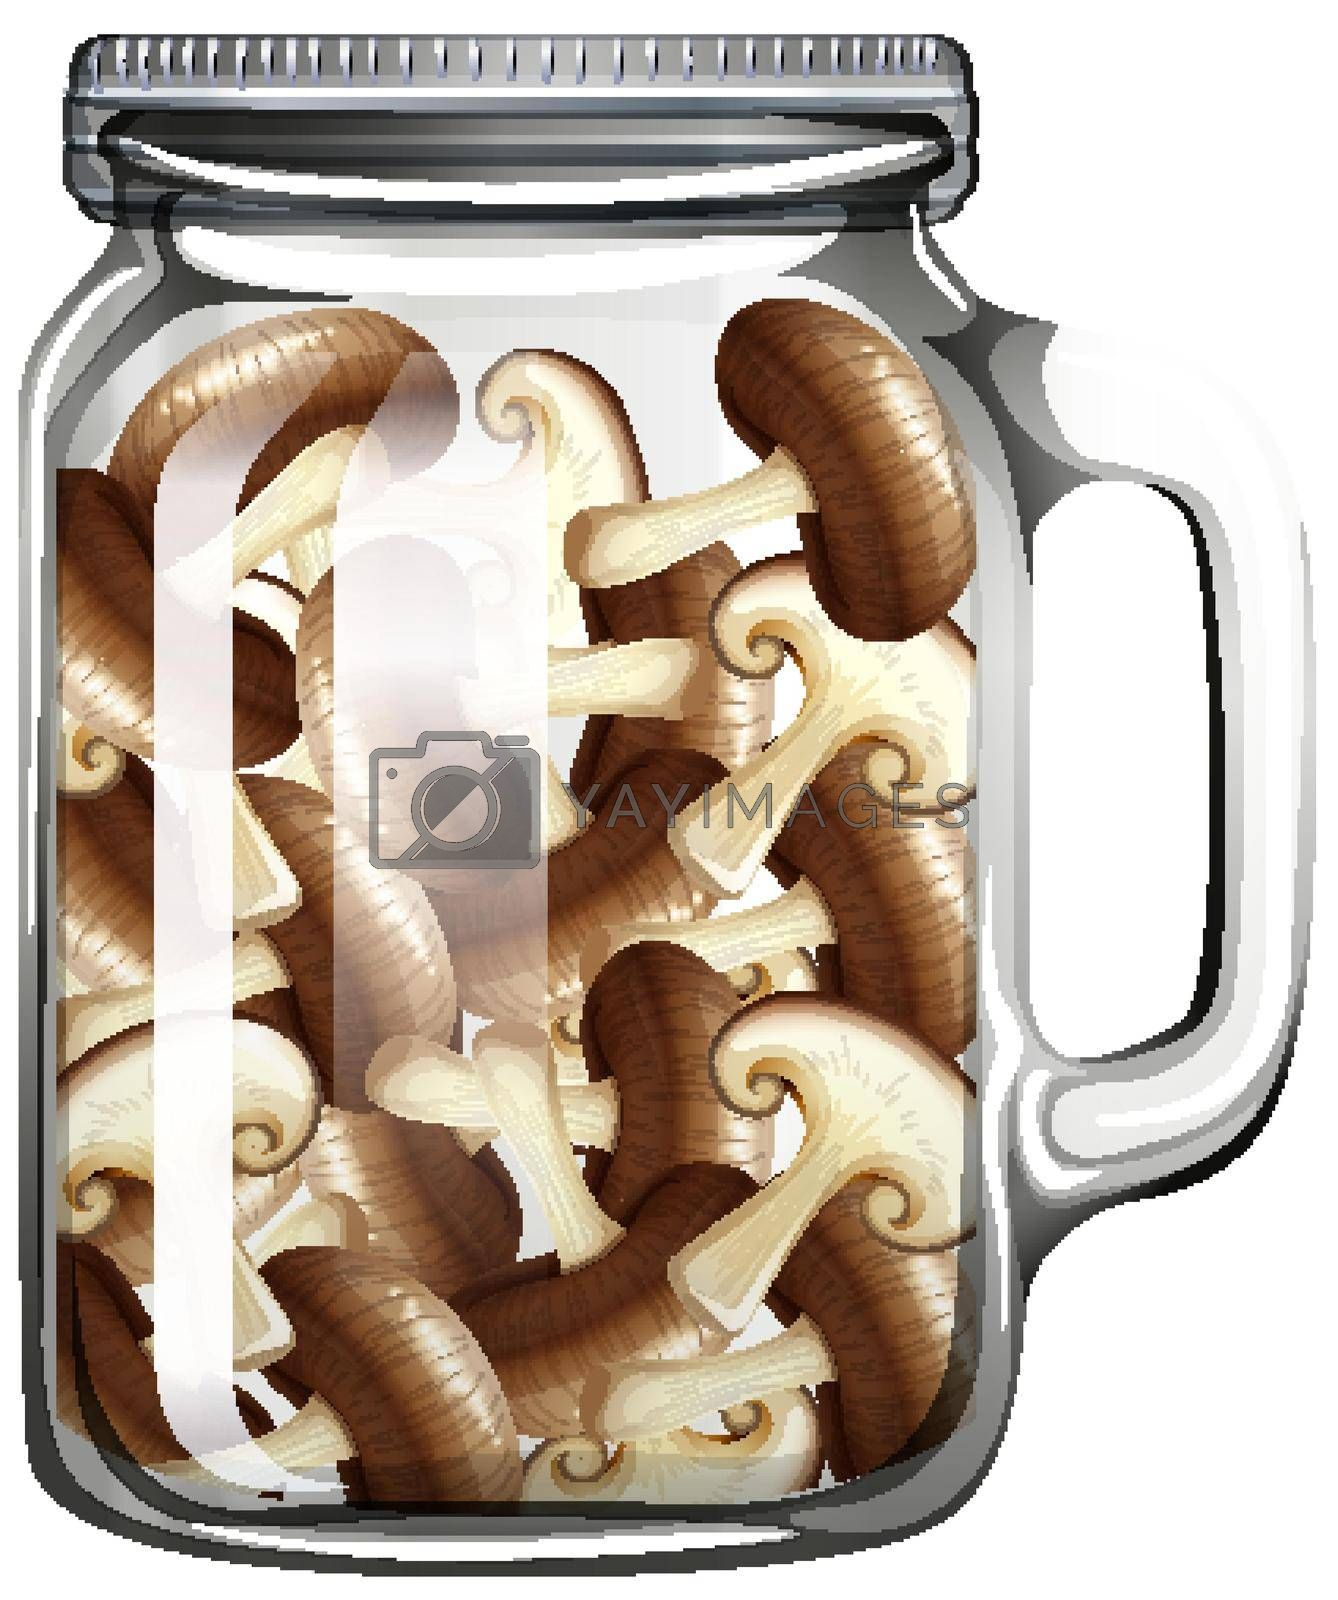 Mushroom in the glass jar illustration